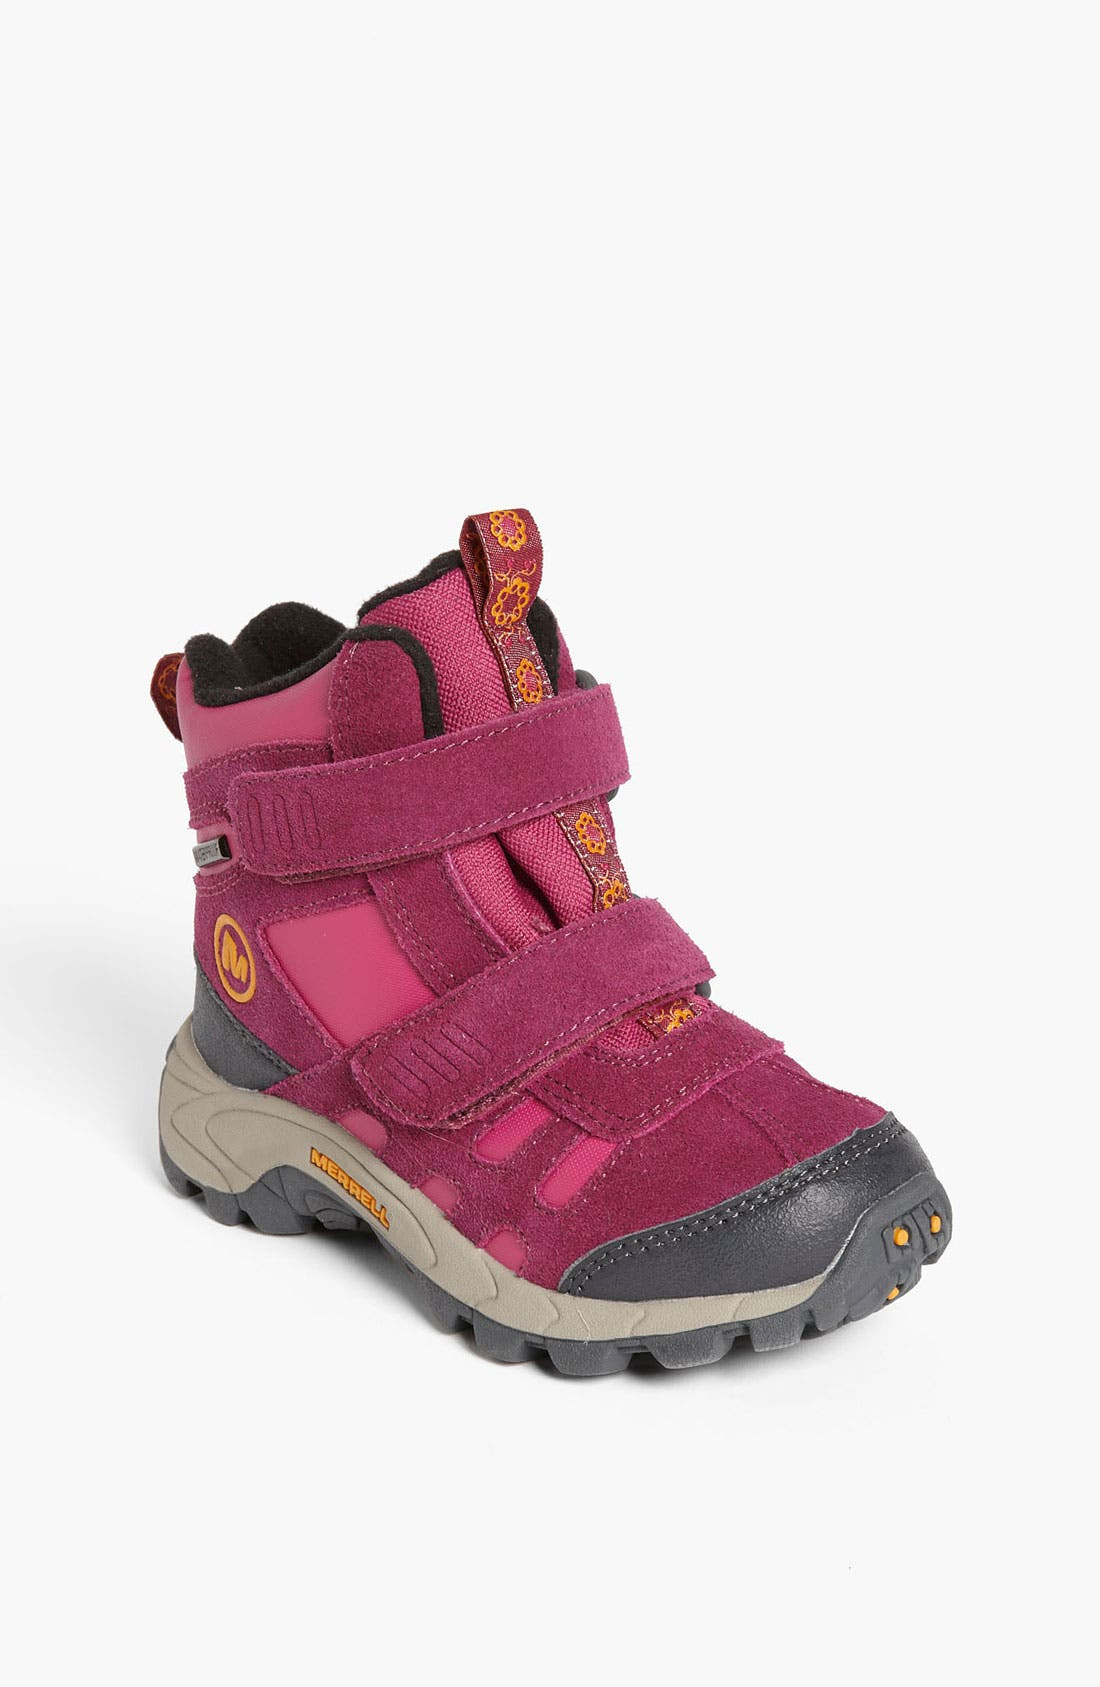 Main Image - Merrell 'Moab Polar Short Strap' Waterproof Boot (Toddler, Little Kid & Big Kid)